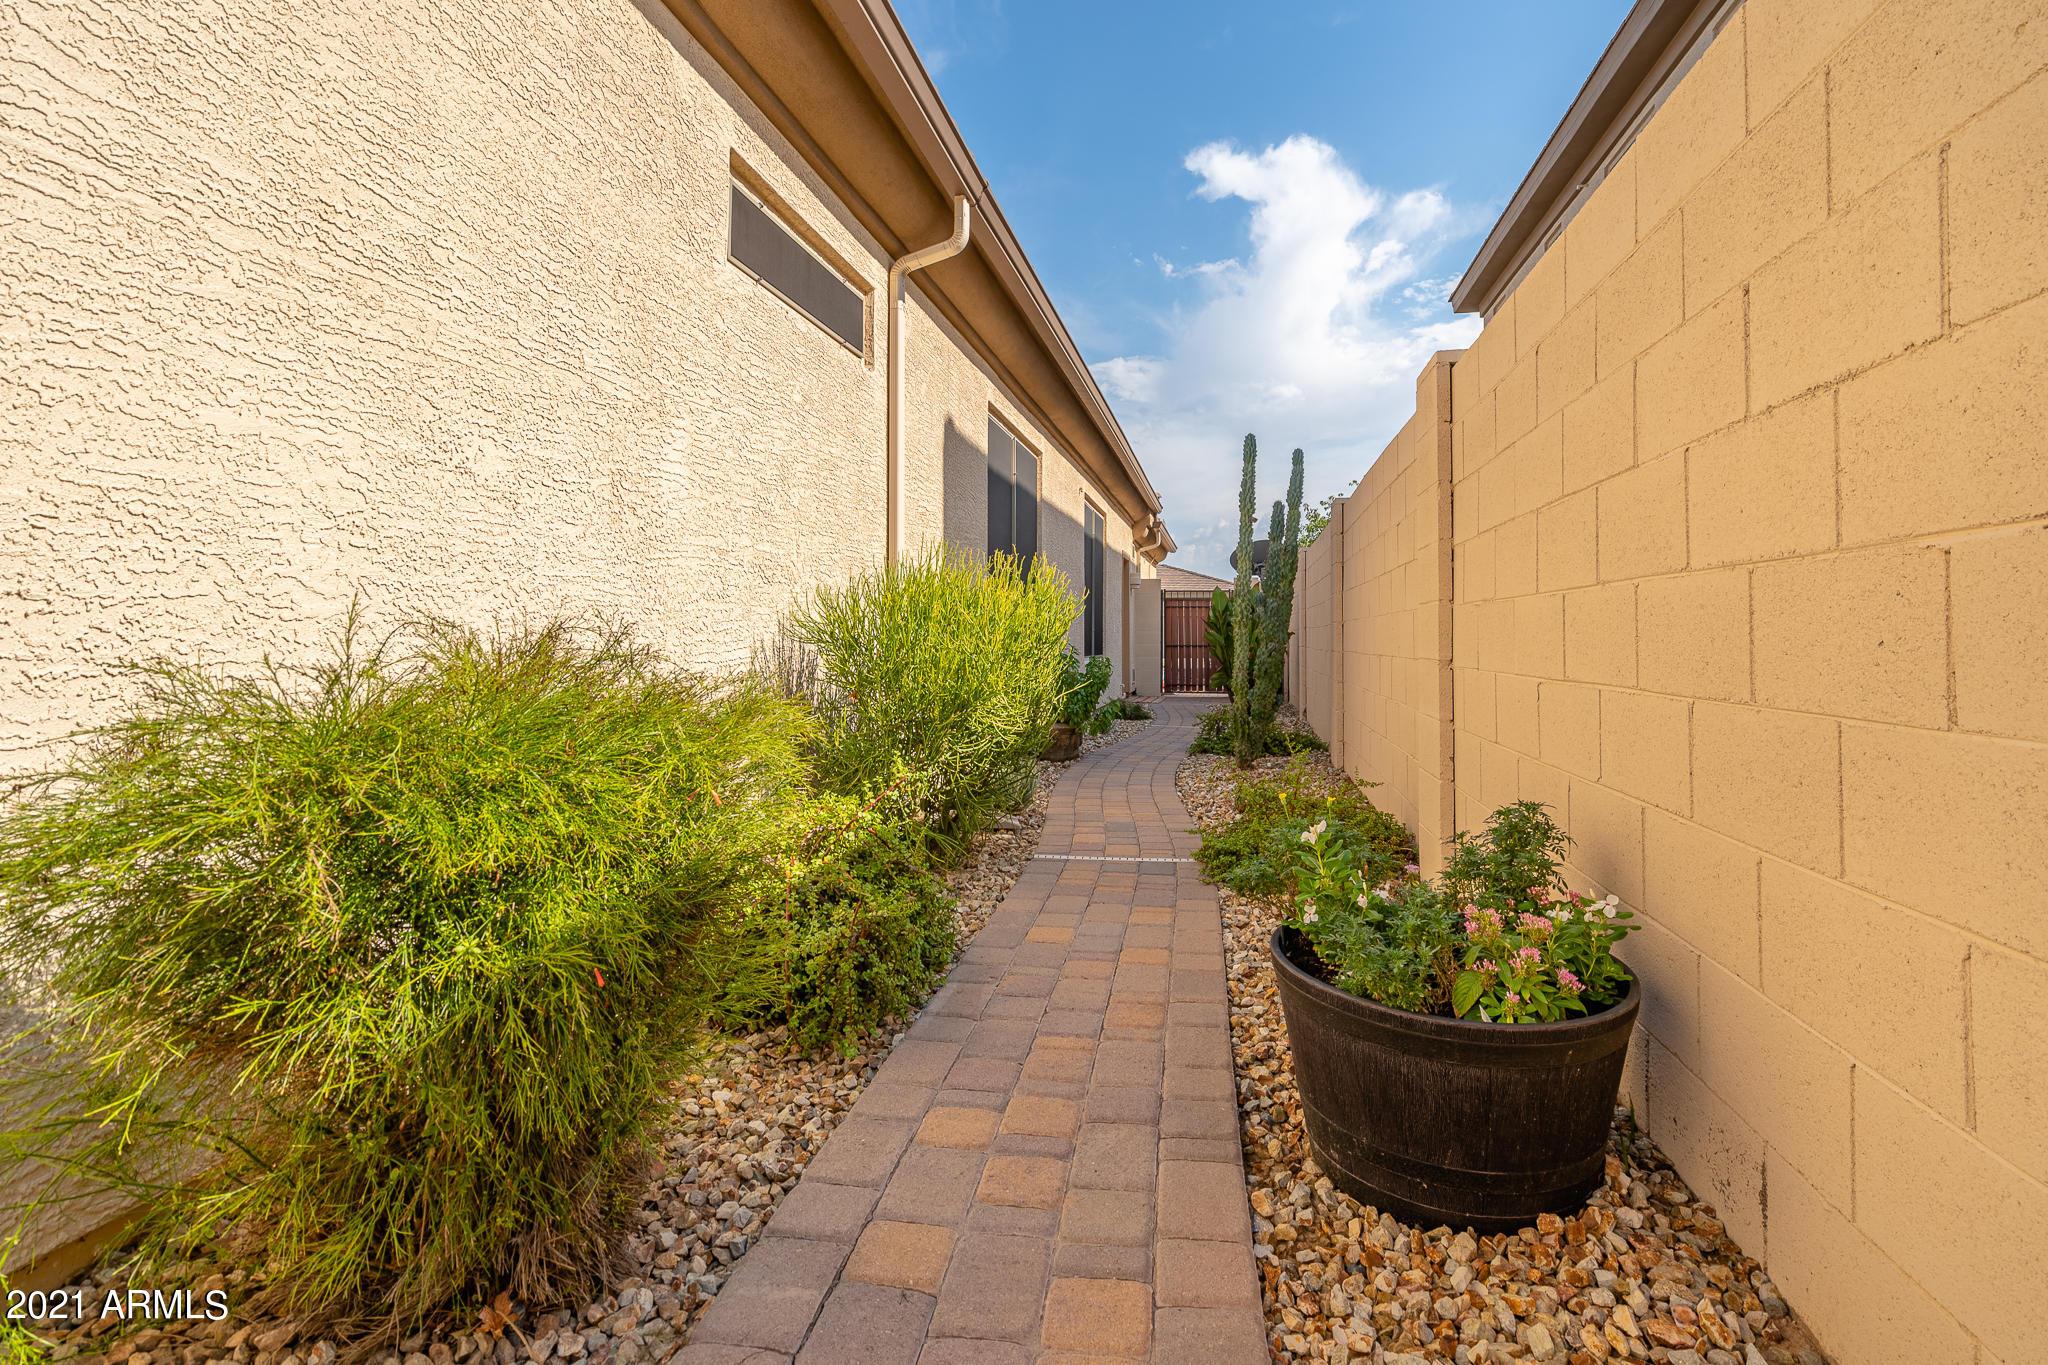 MLS 6267623 924 W GROVE Street, Litchfield Park, AZ 85340 Litchfield Park AZ Three Bedroom